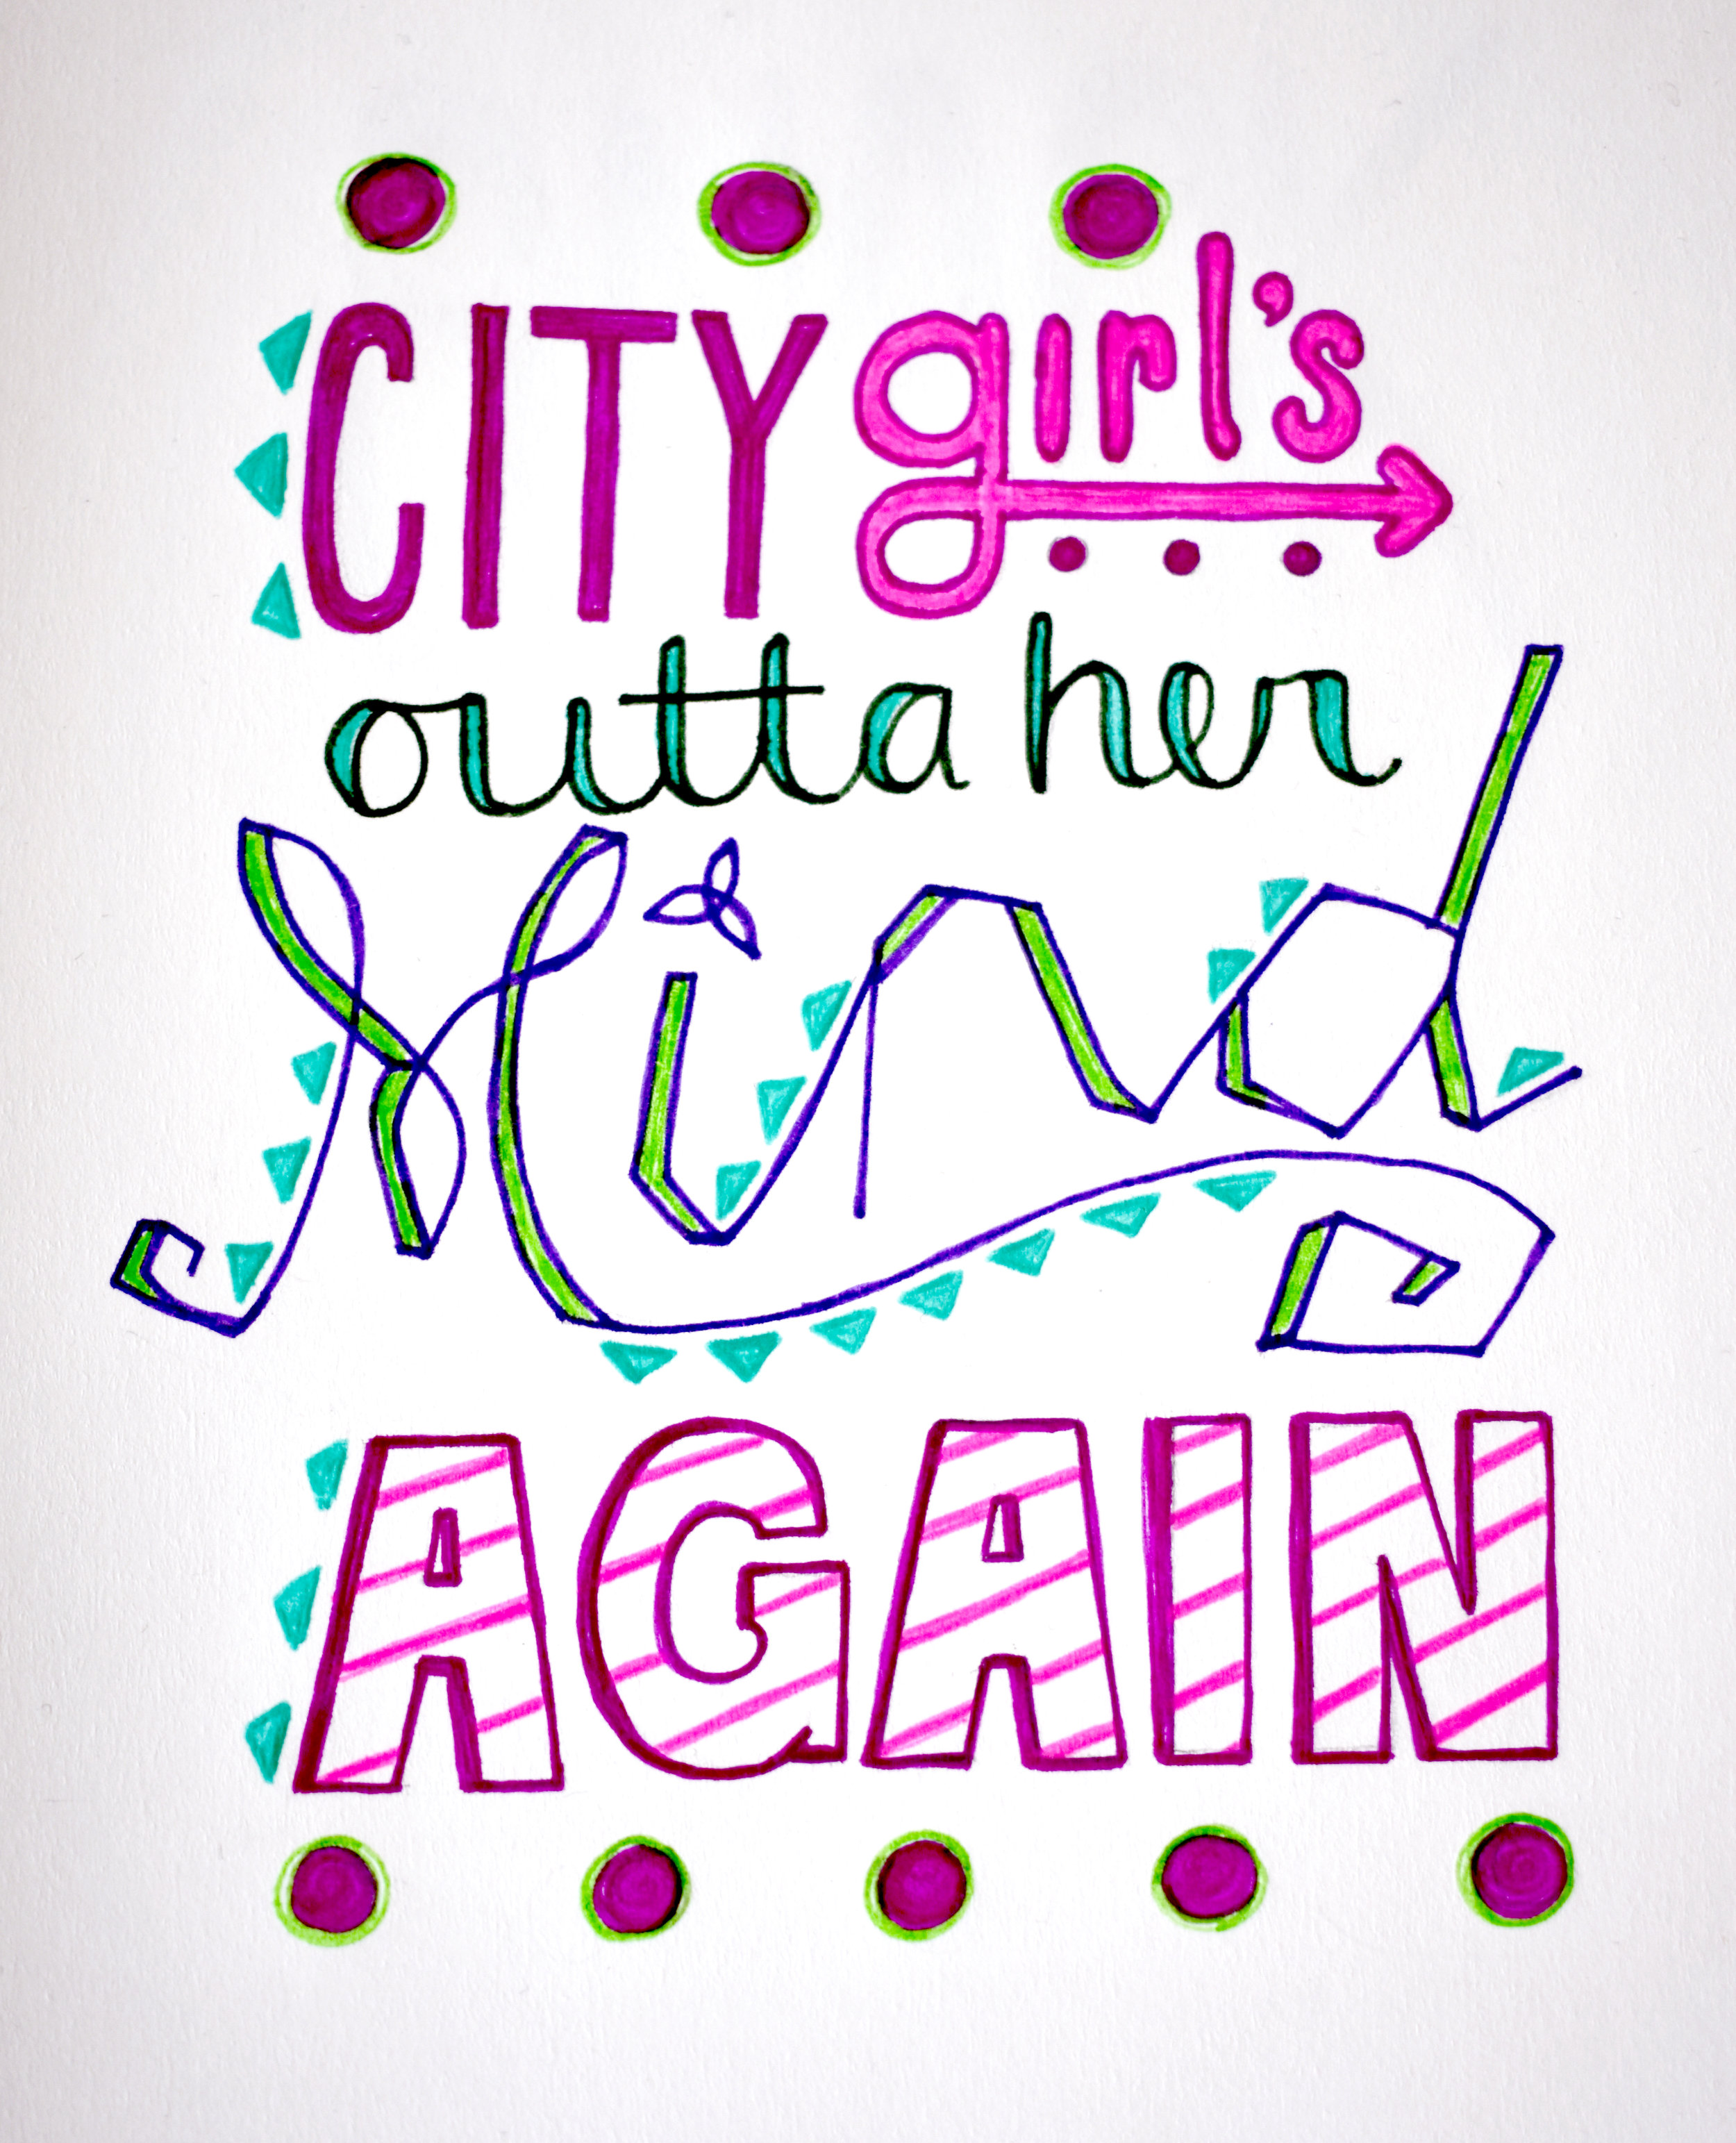 CityGirlsOuttaHerMind.jpg